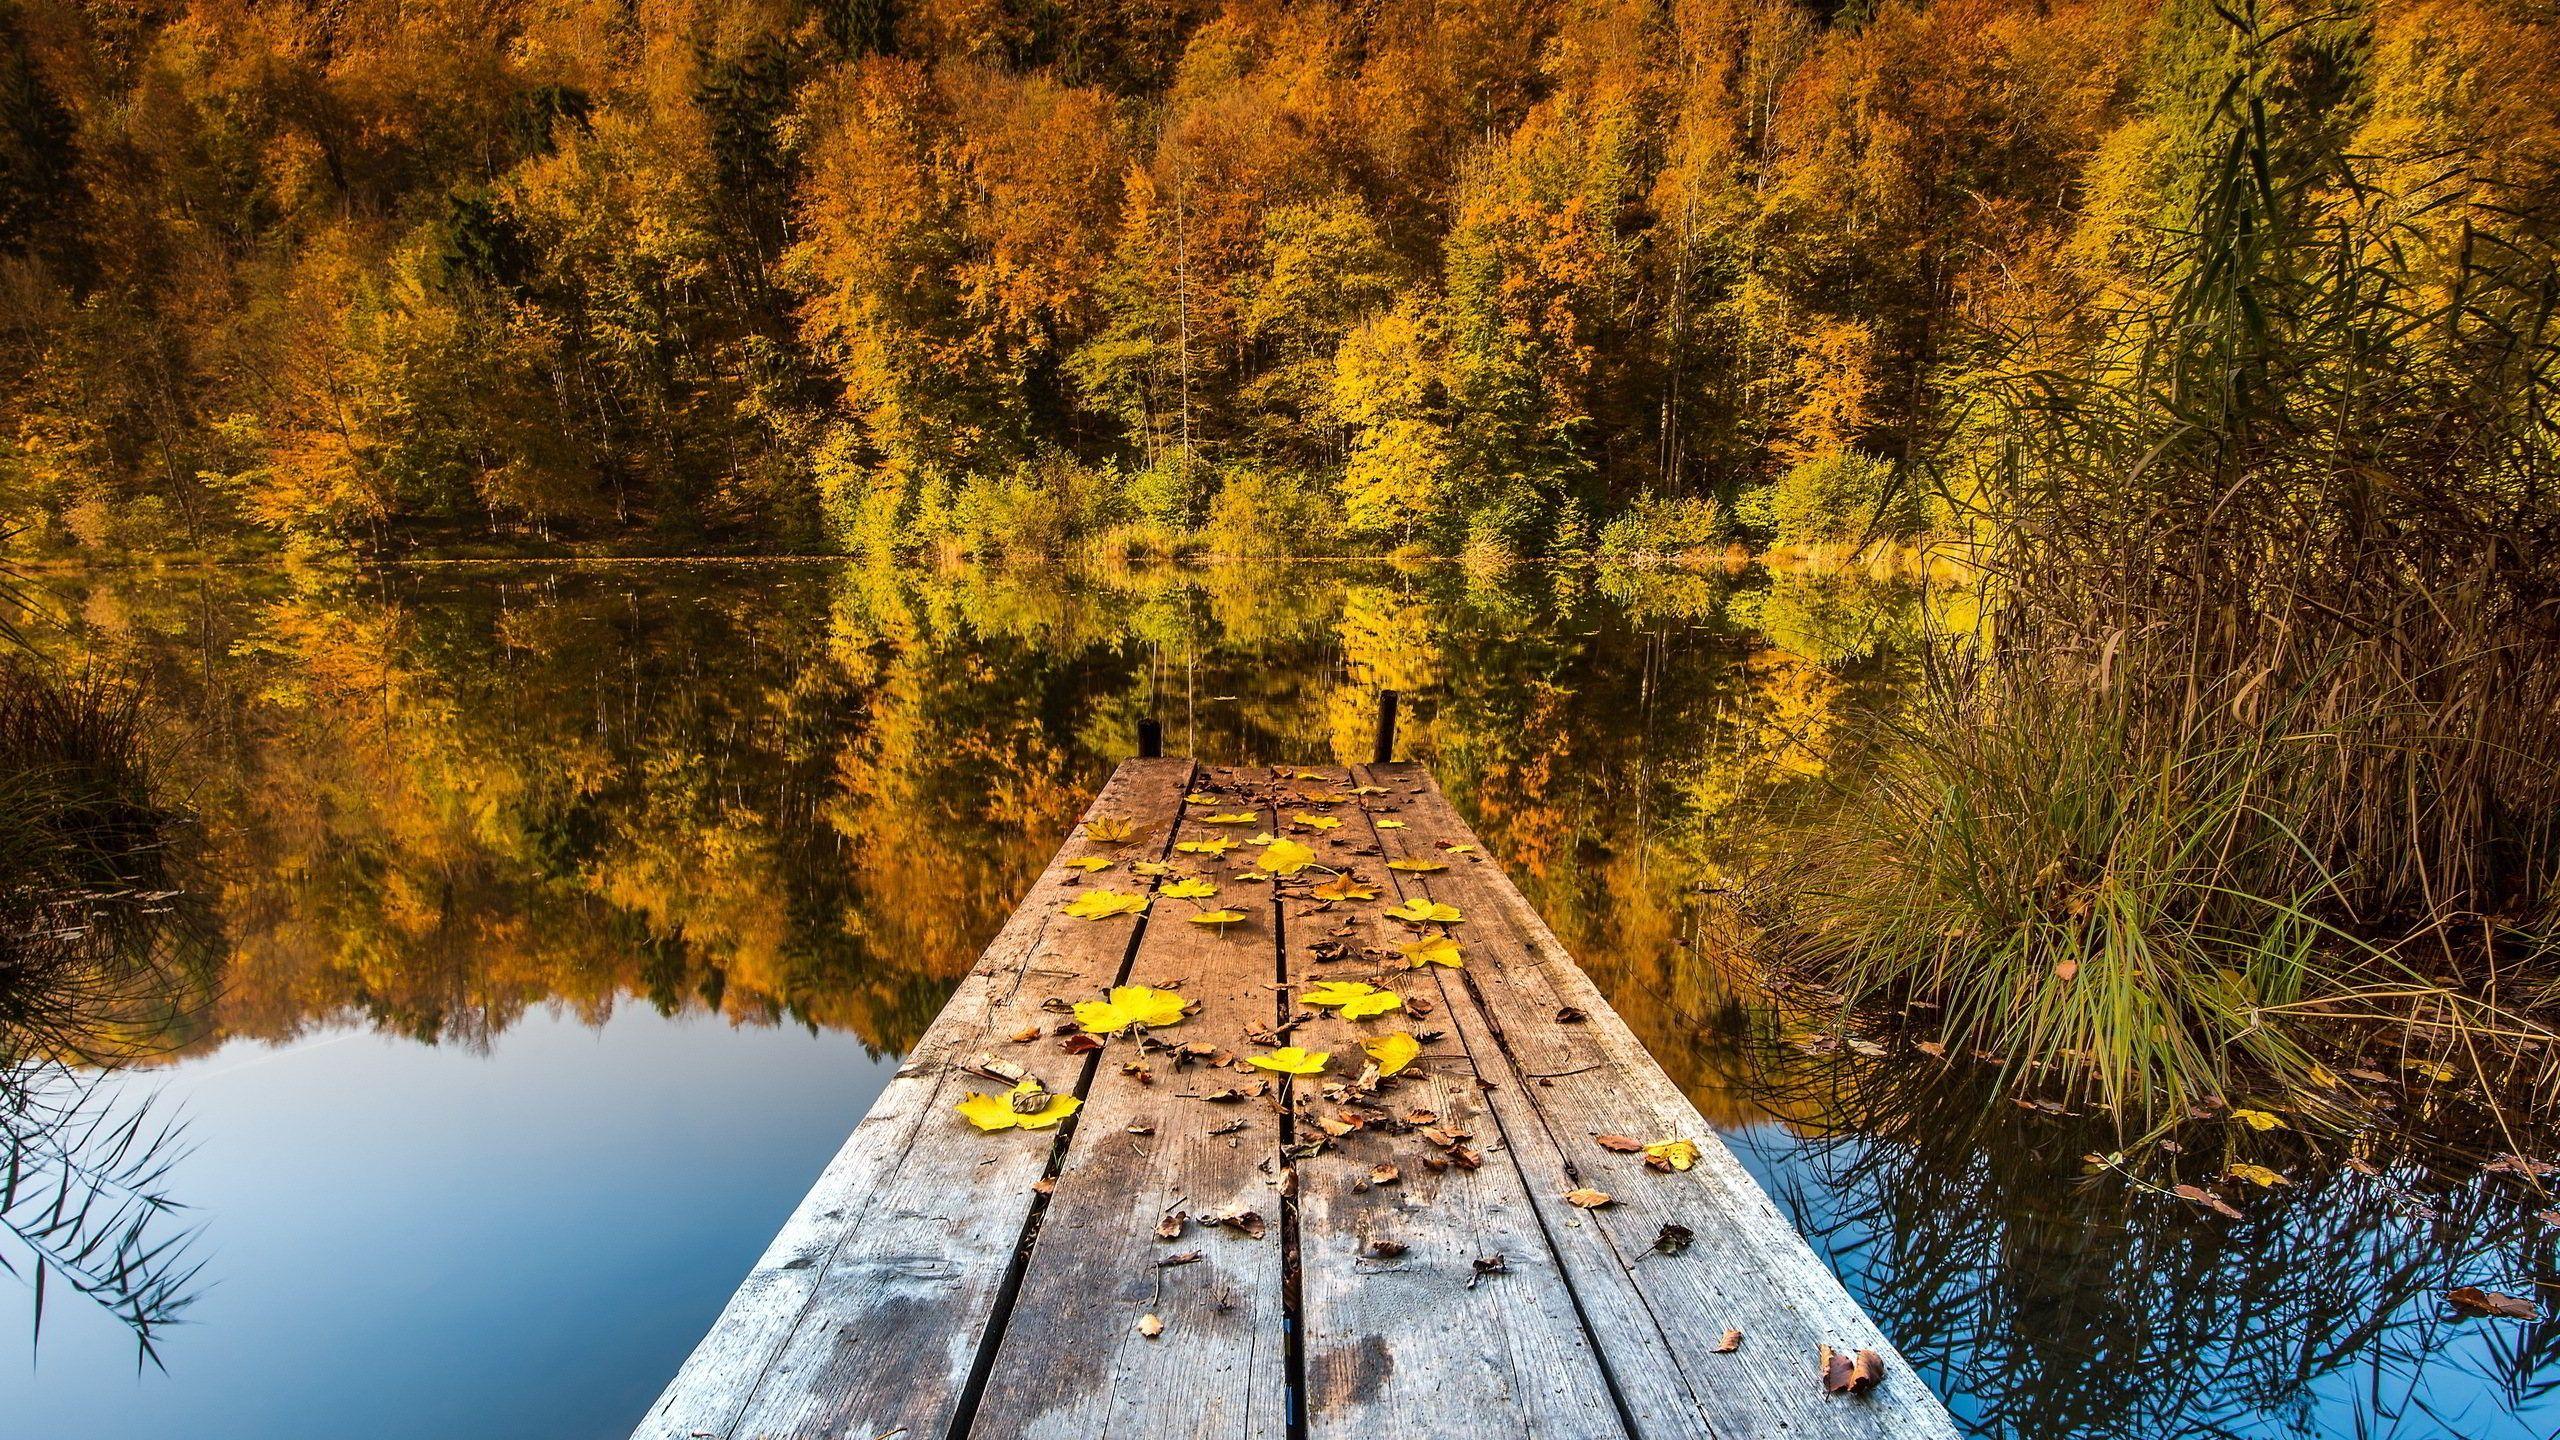 Falling Leaves Wallpaper Blackberry Autumn Lake View Autumn Lake Wallpaper In 2560x1440